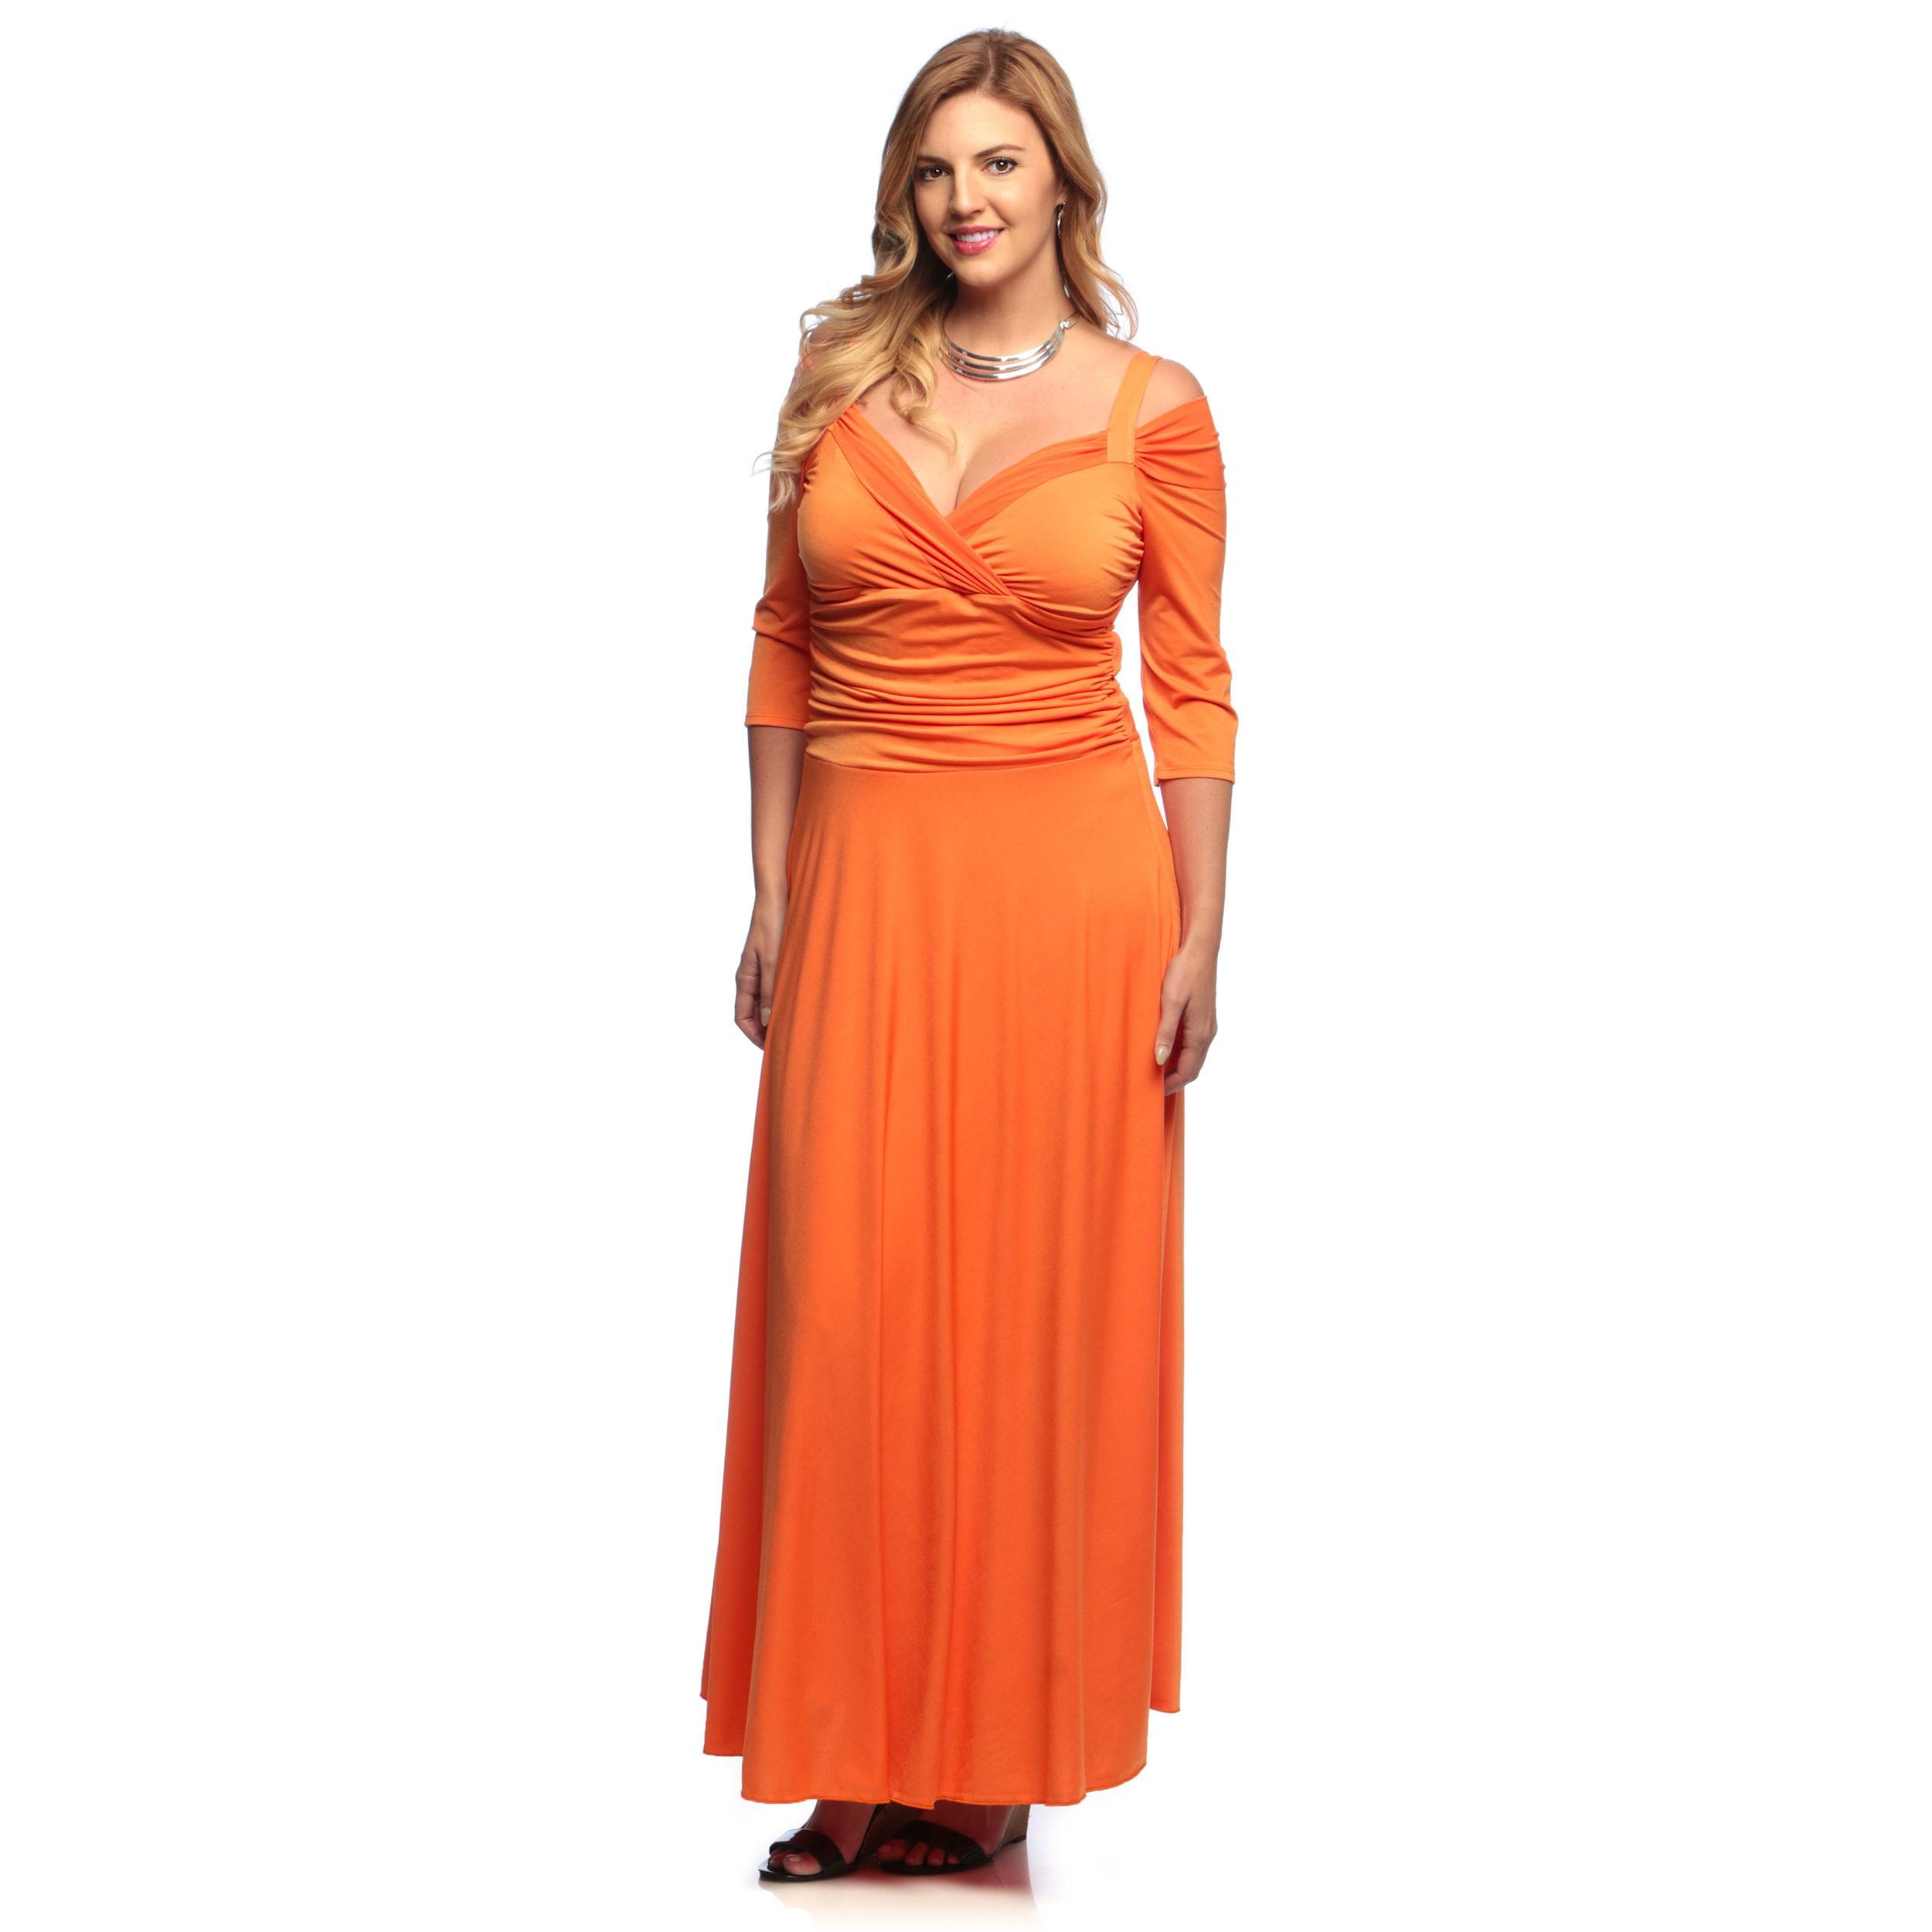 Evanese Women\'s Plus Size 3/4-sleeve Long Dress